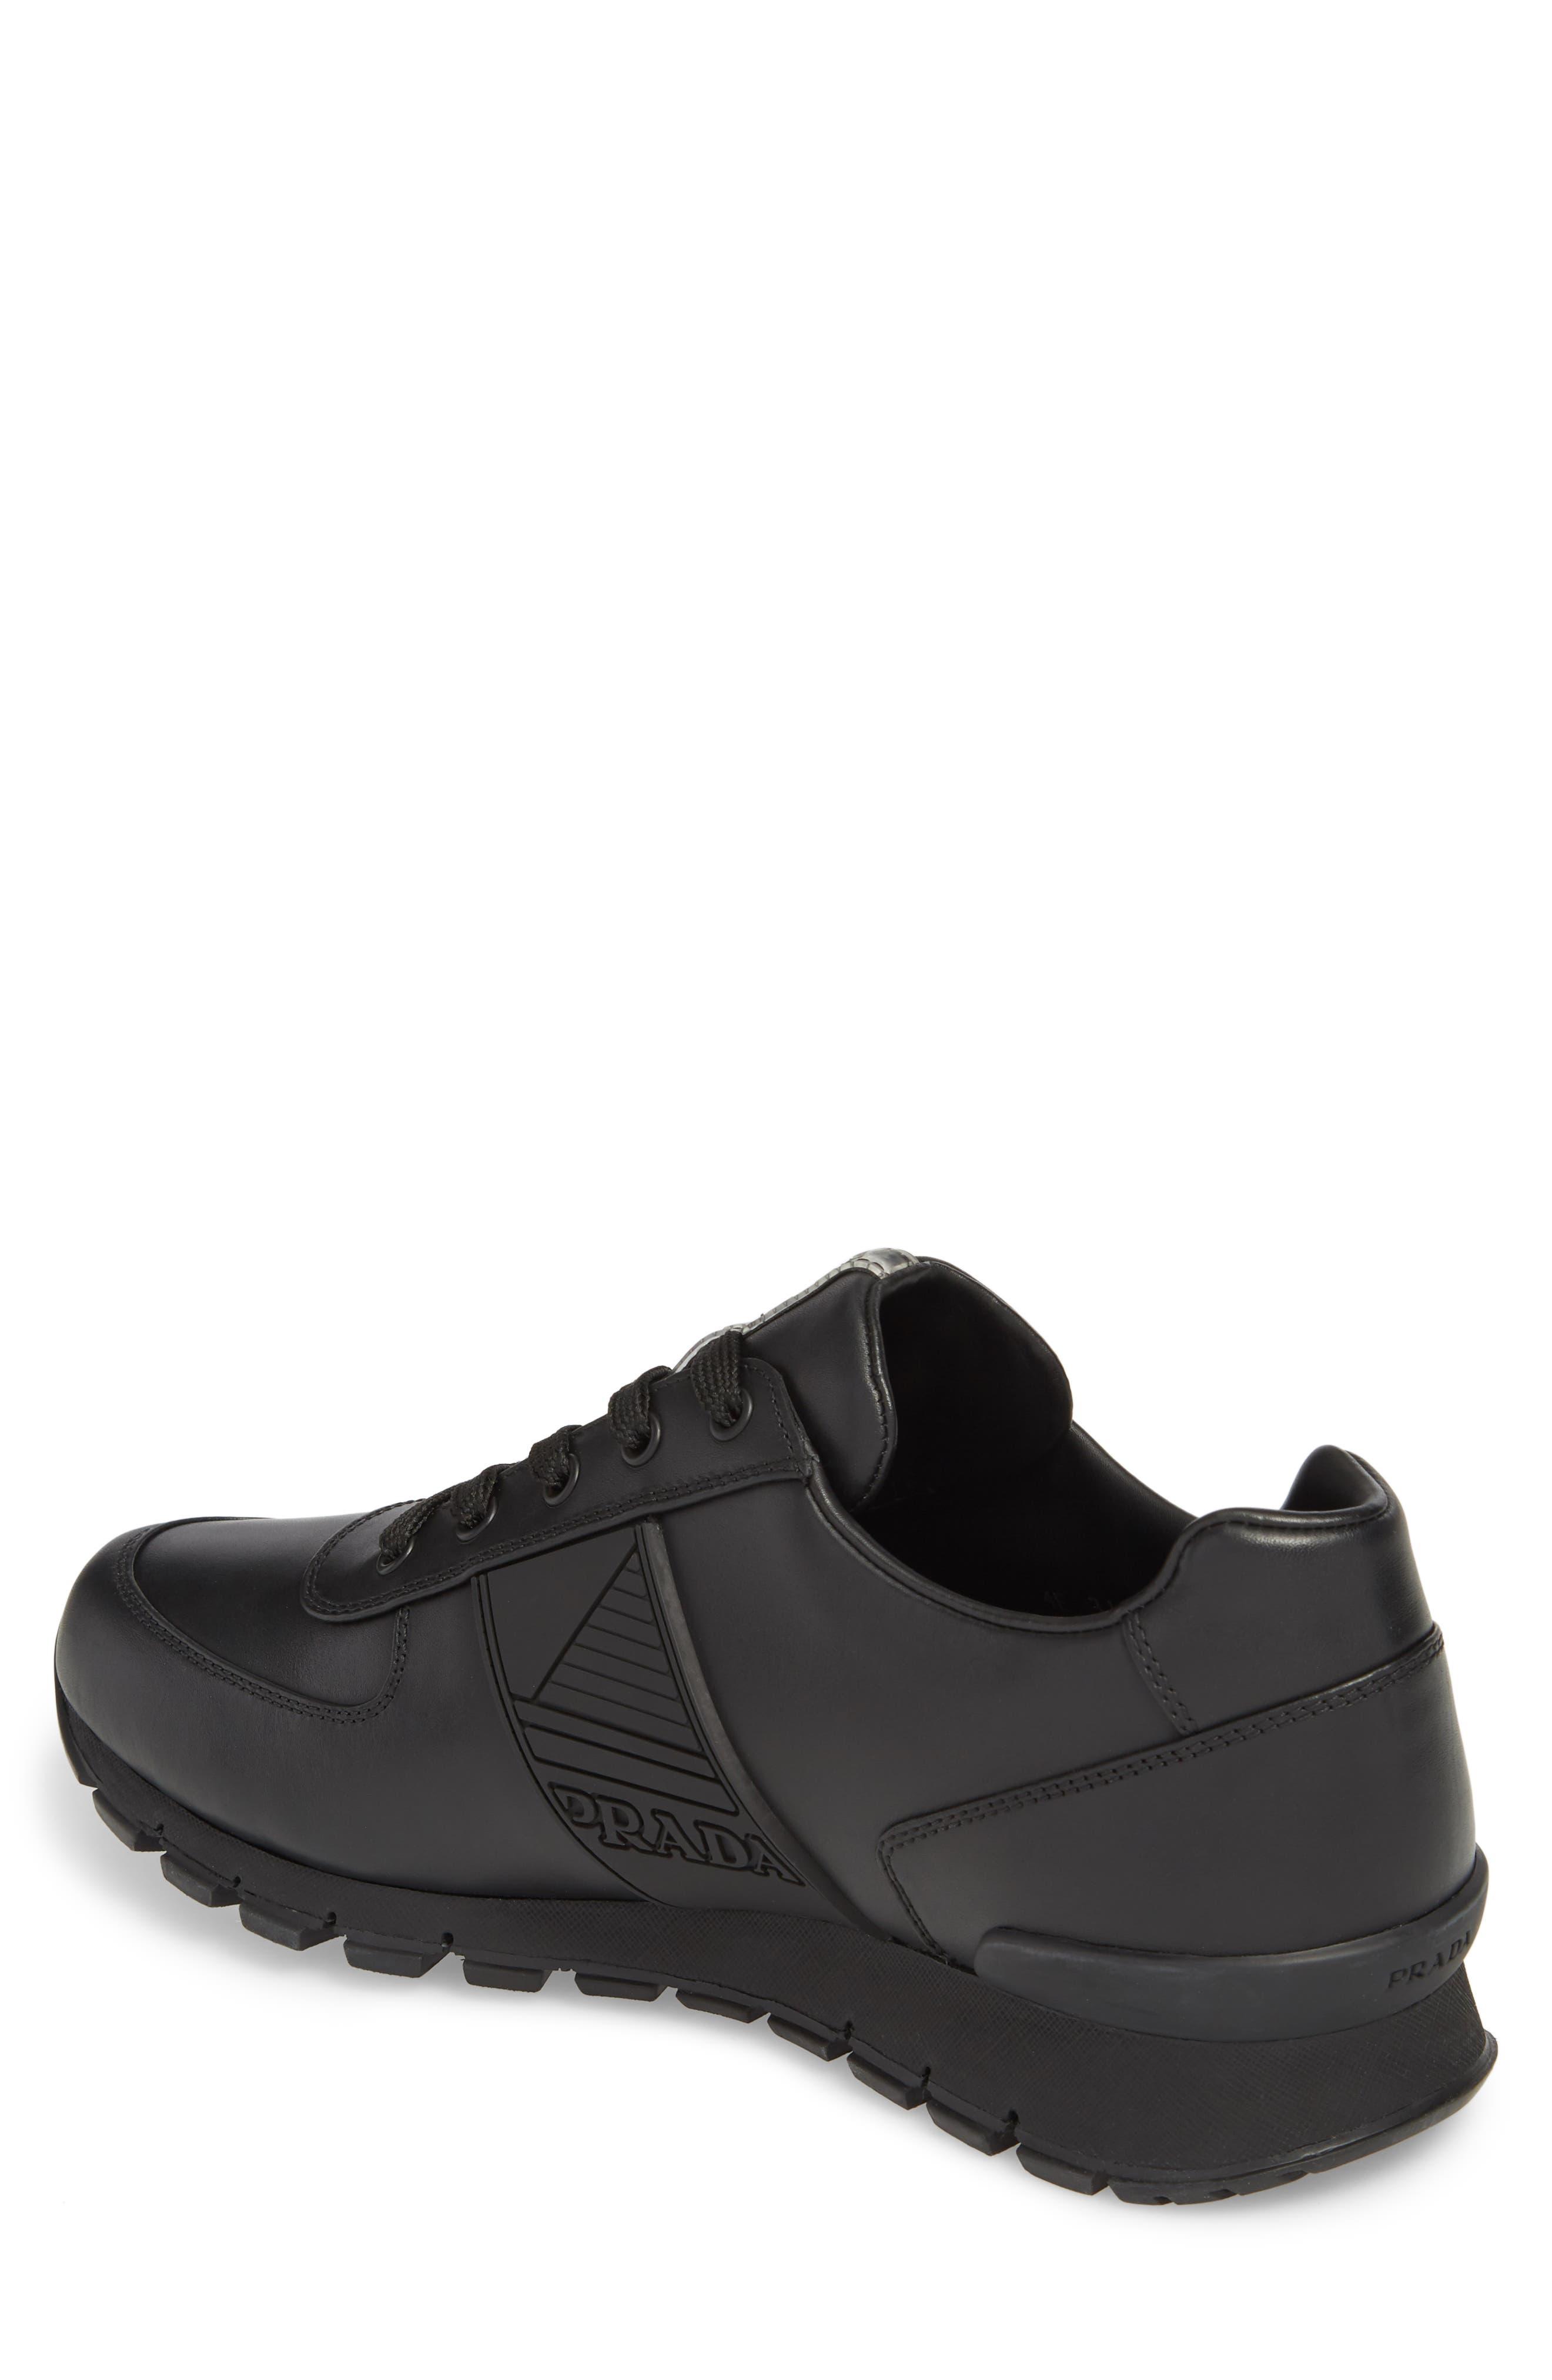 PRADA,                             Linea Rossa Sneaker,                             Alternate thumbnail 2, color,                             001